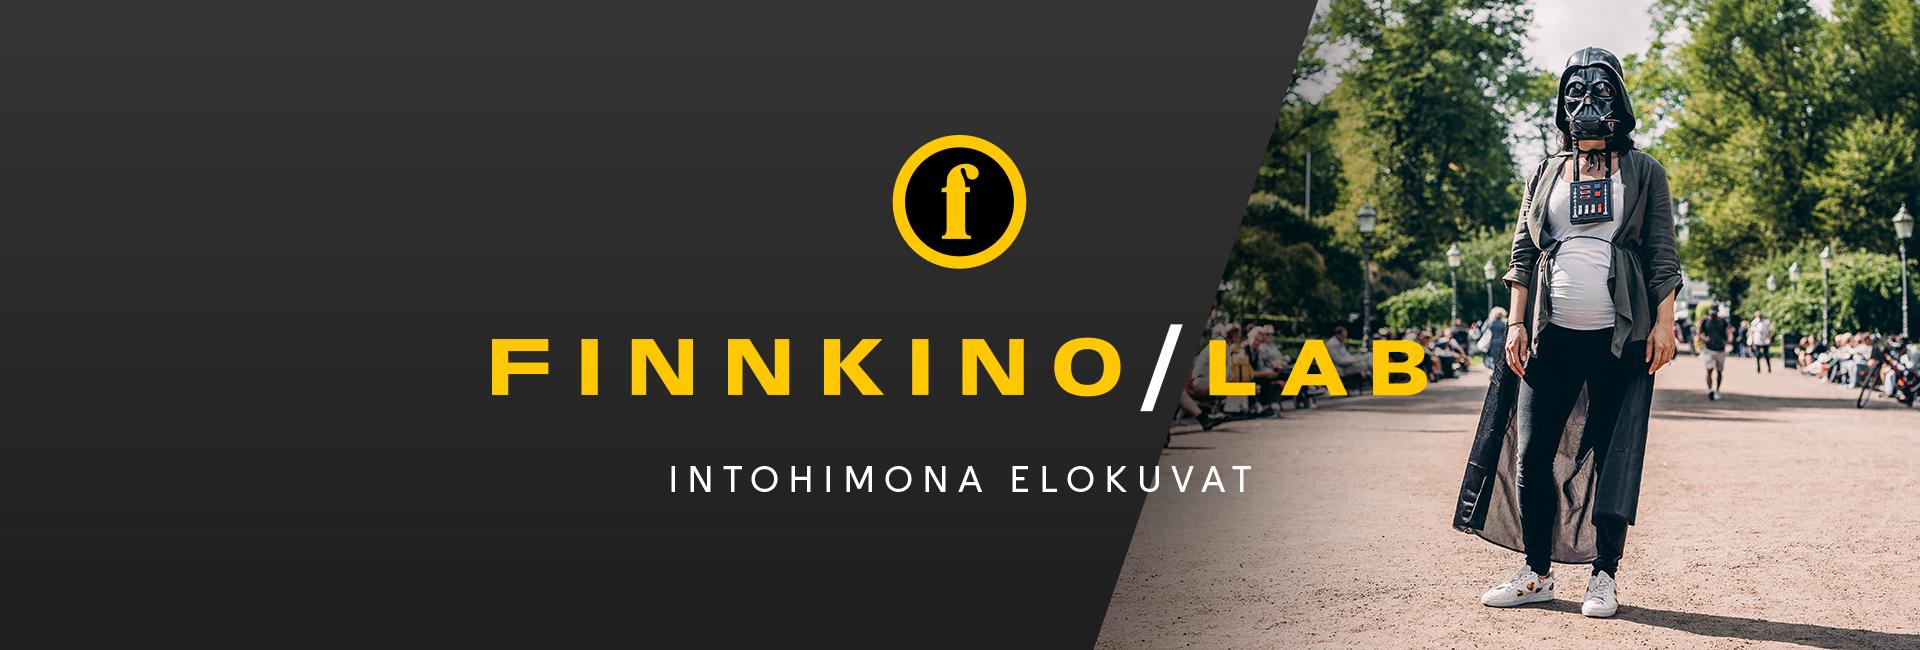 Finnkino Lab